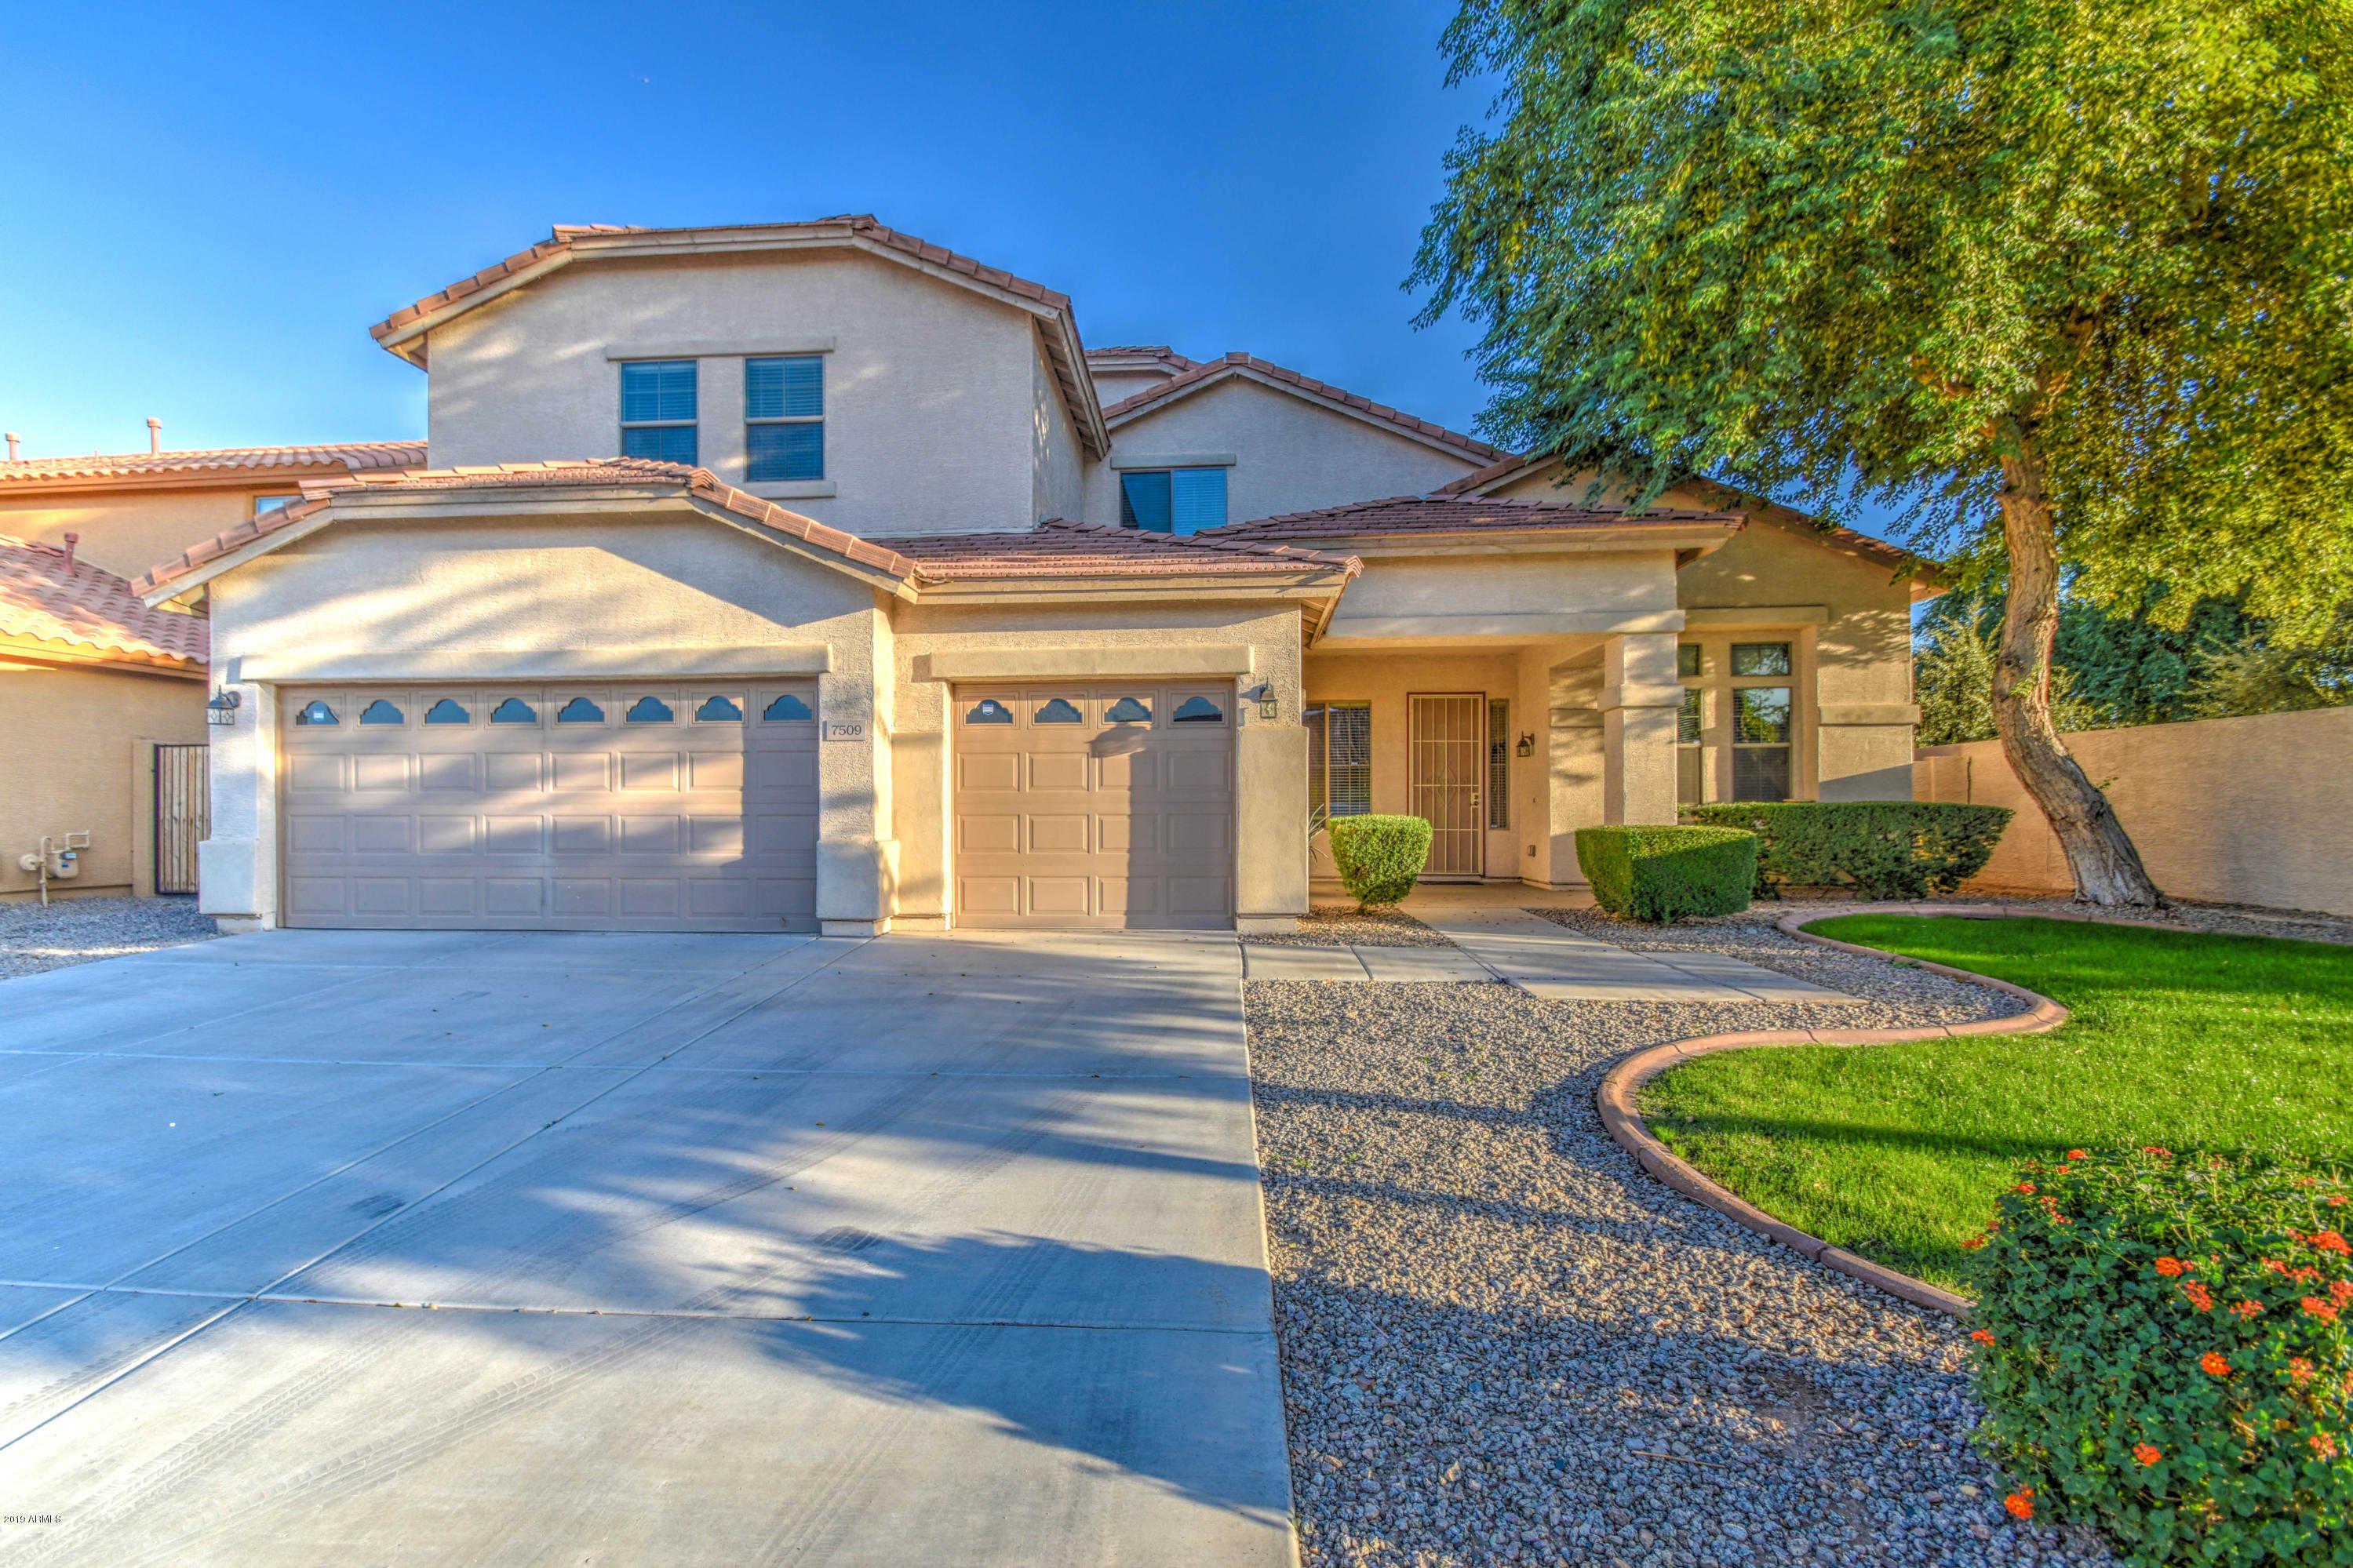 $394,500 - 5Br/3Ba - Home for Sale in Rovey Farm Estates North, Glendale